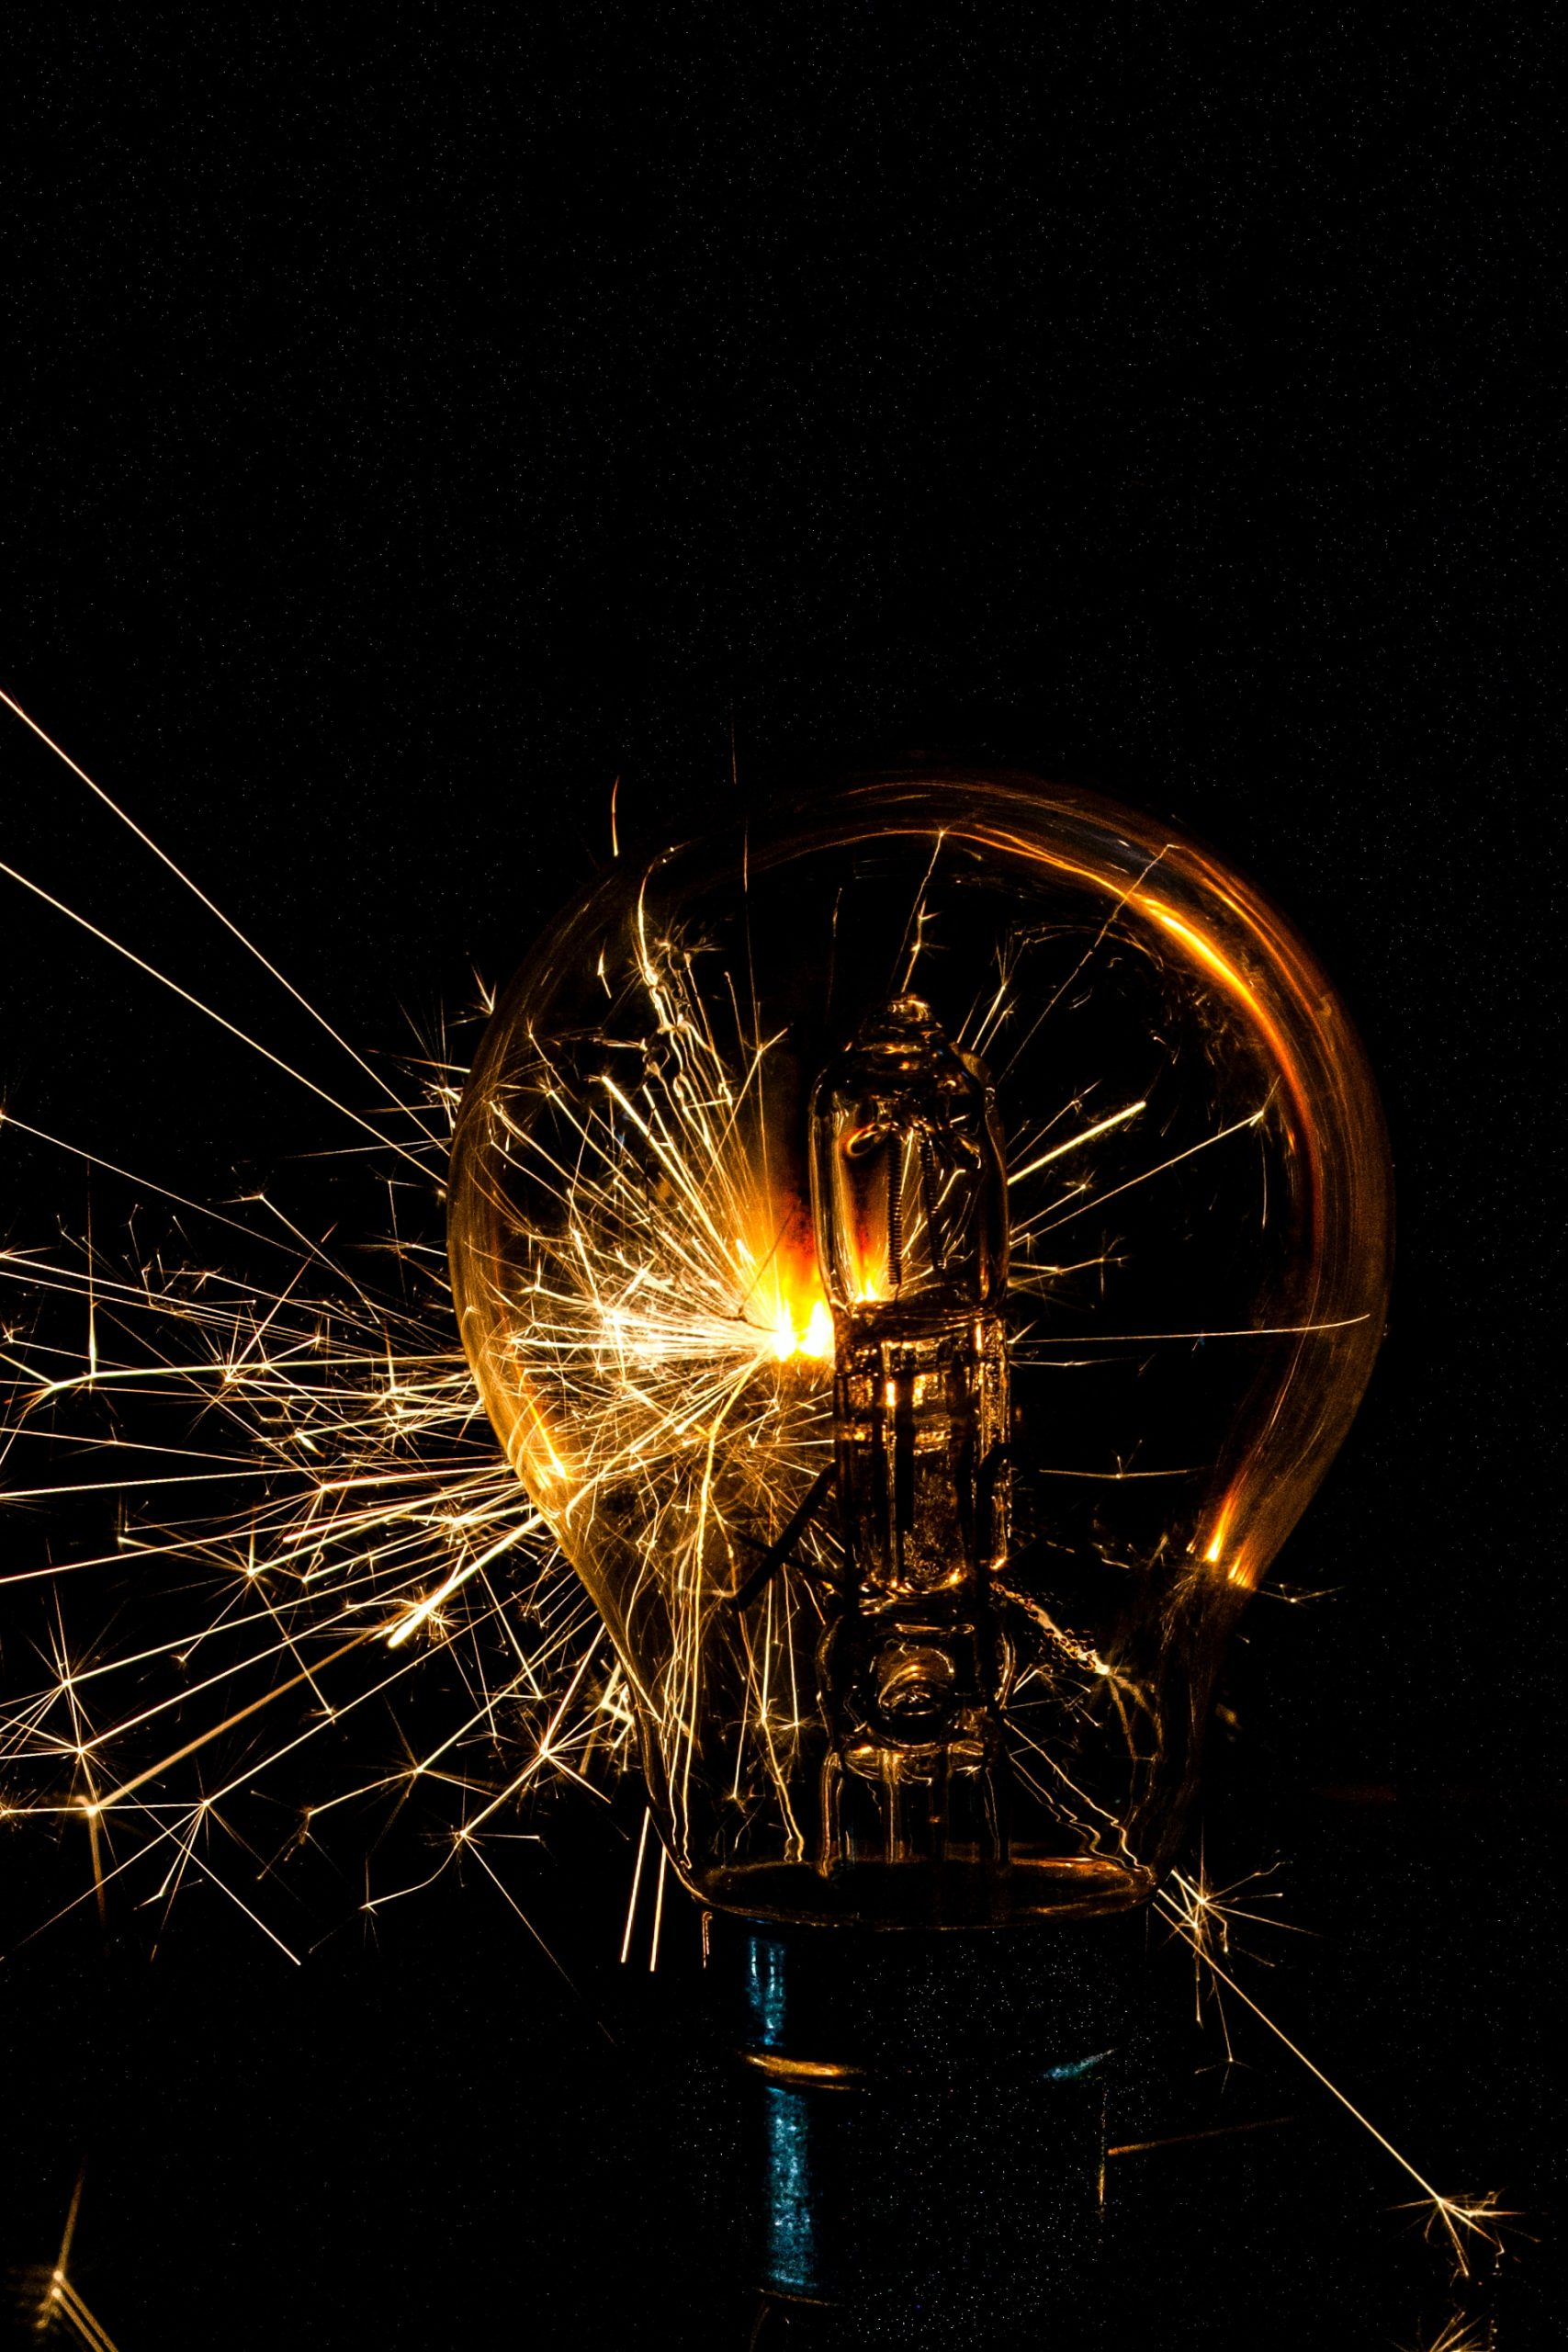 Light Bulb with Spark - Generate Creativity through Marketing